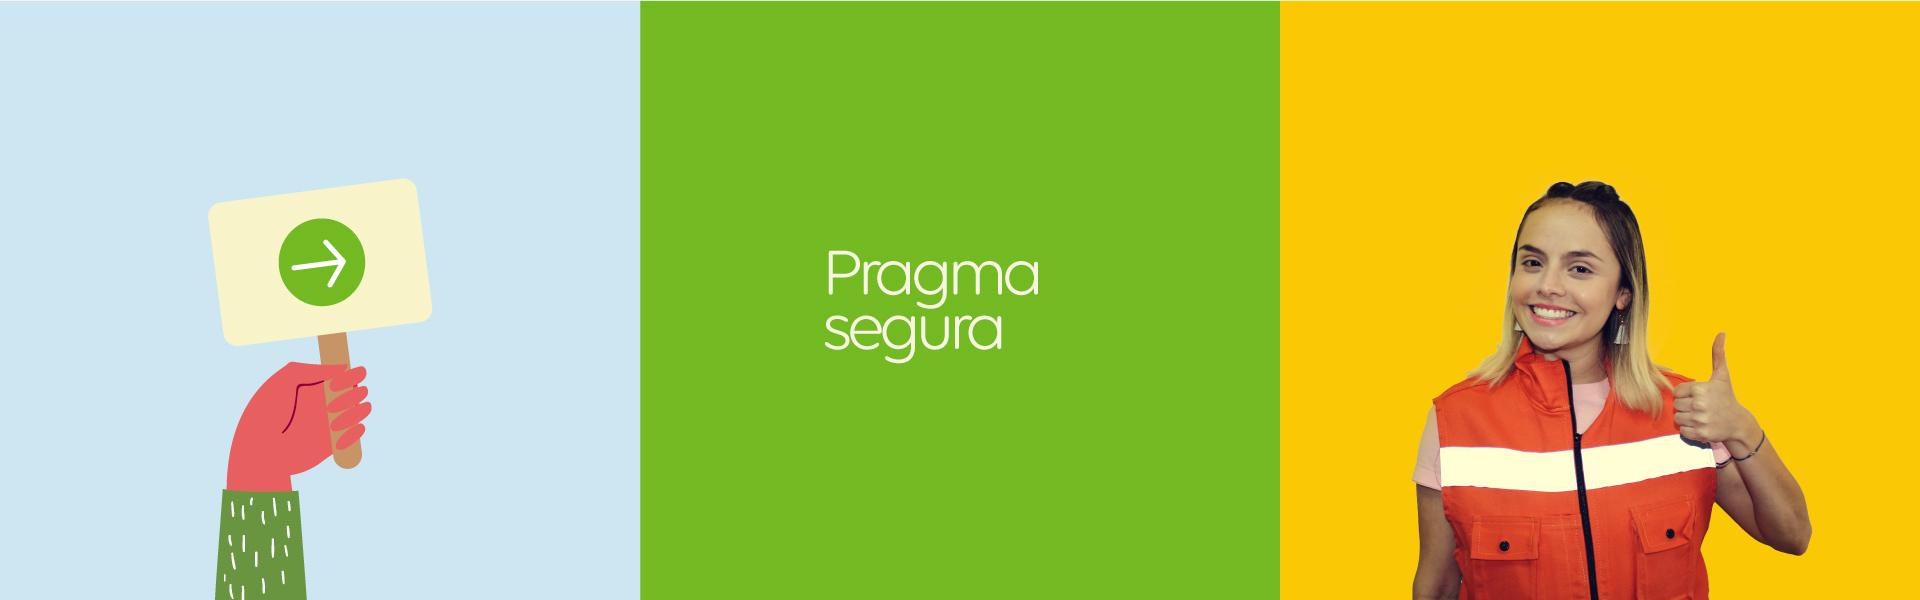 header_EPNC_pragma_segura2